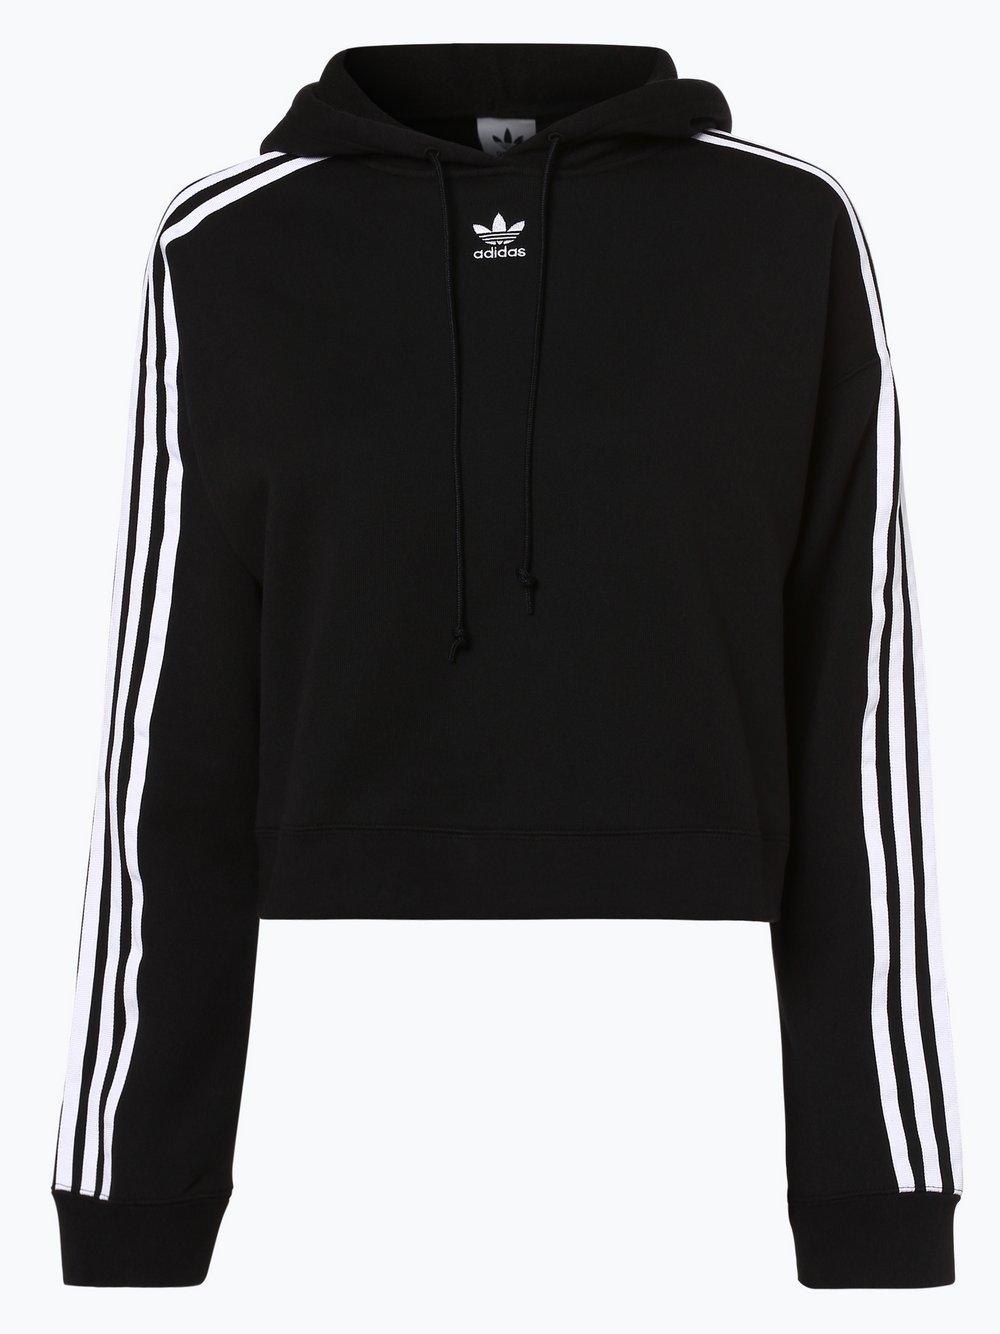 adidas Originals Damska bluza nierozpinana kup online